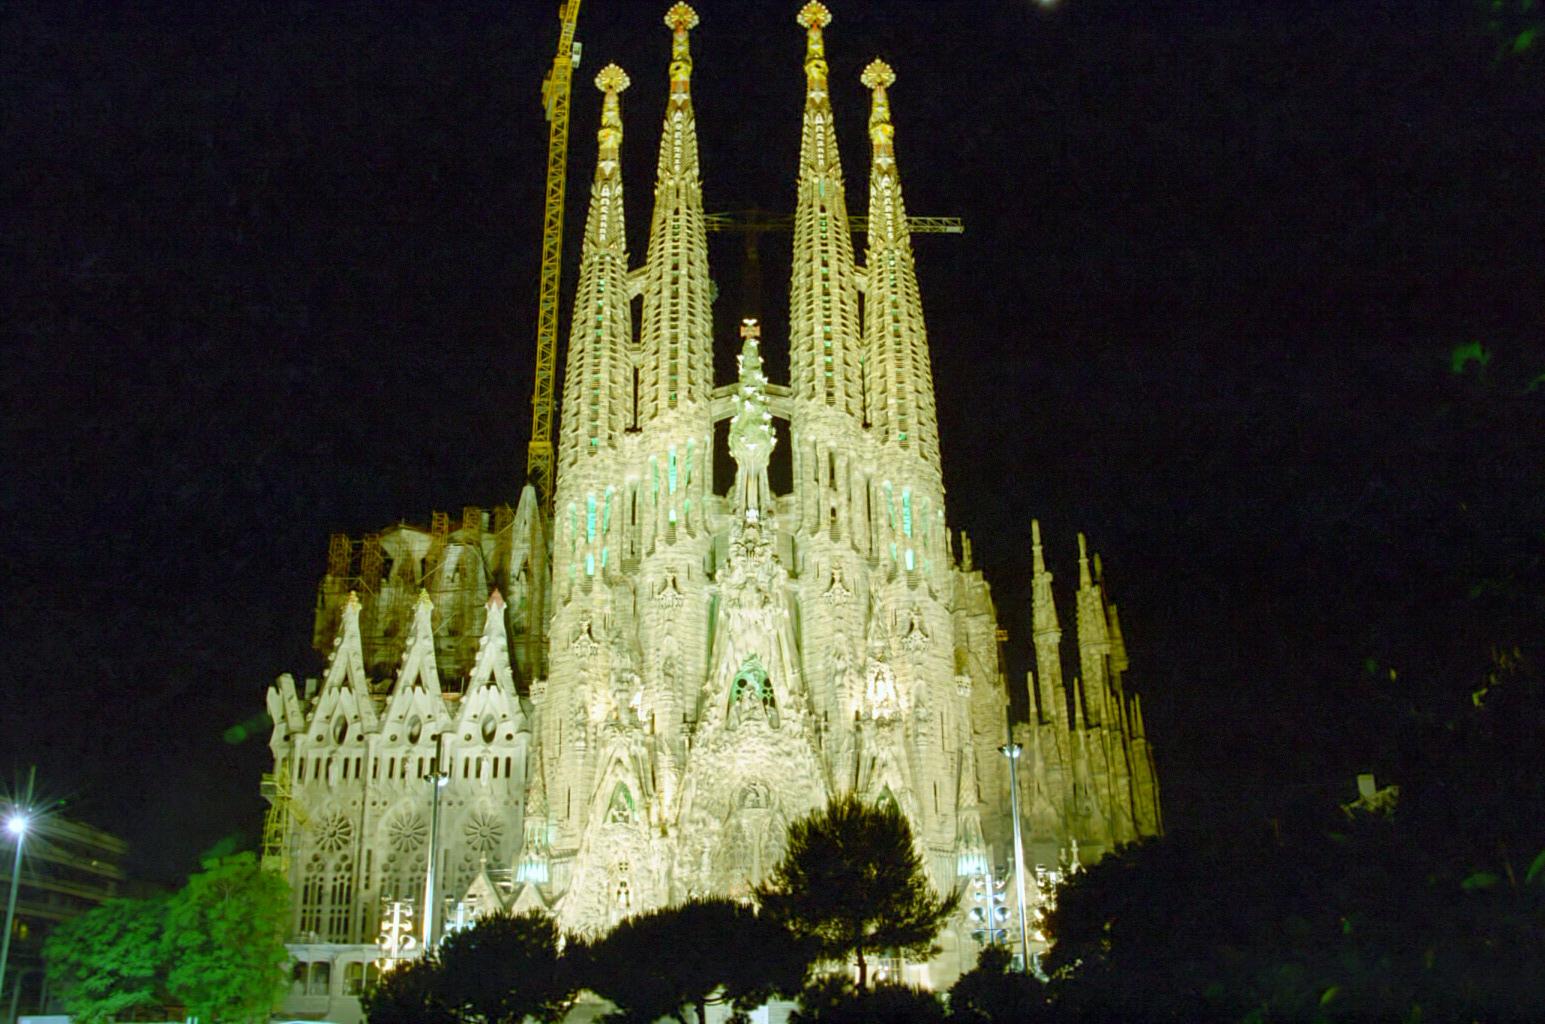 Arquitetando igreja da sagrada fam lia barcelona - Estilo sagrada familia ...